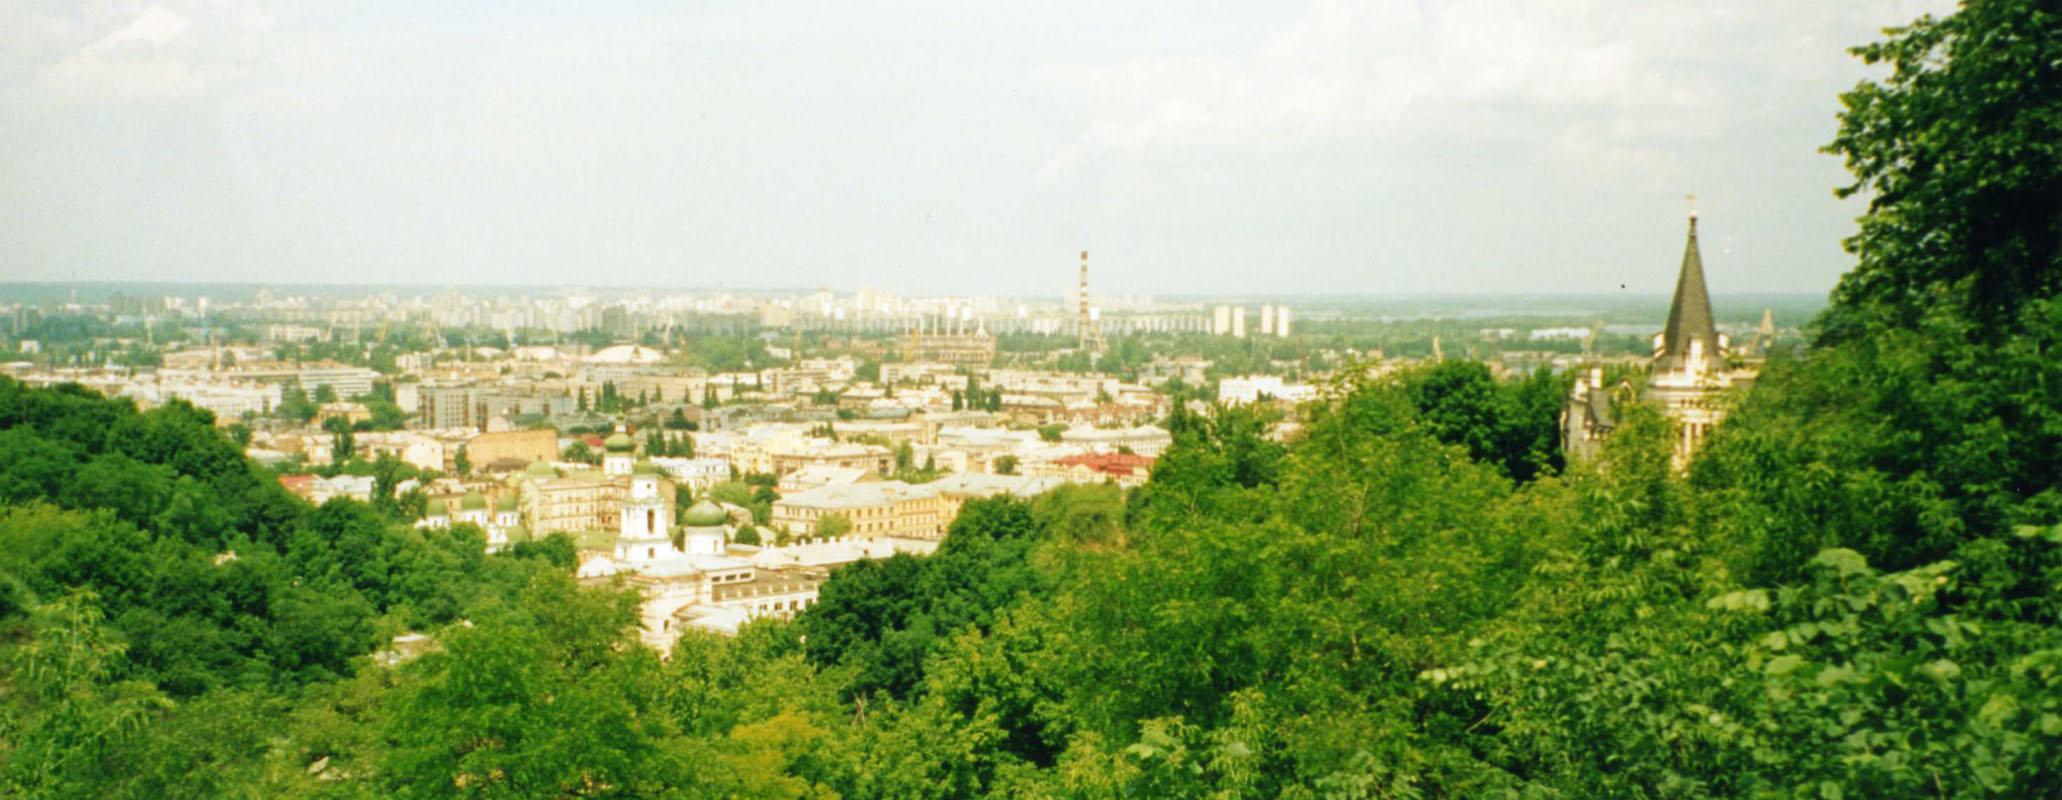 Panoramablick auf Kiew